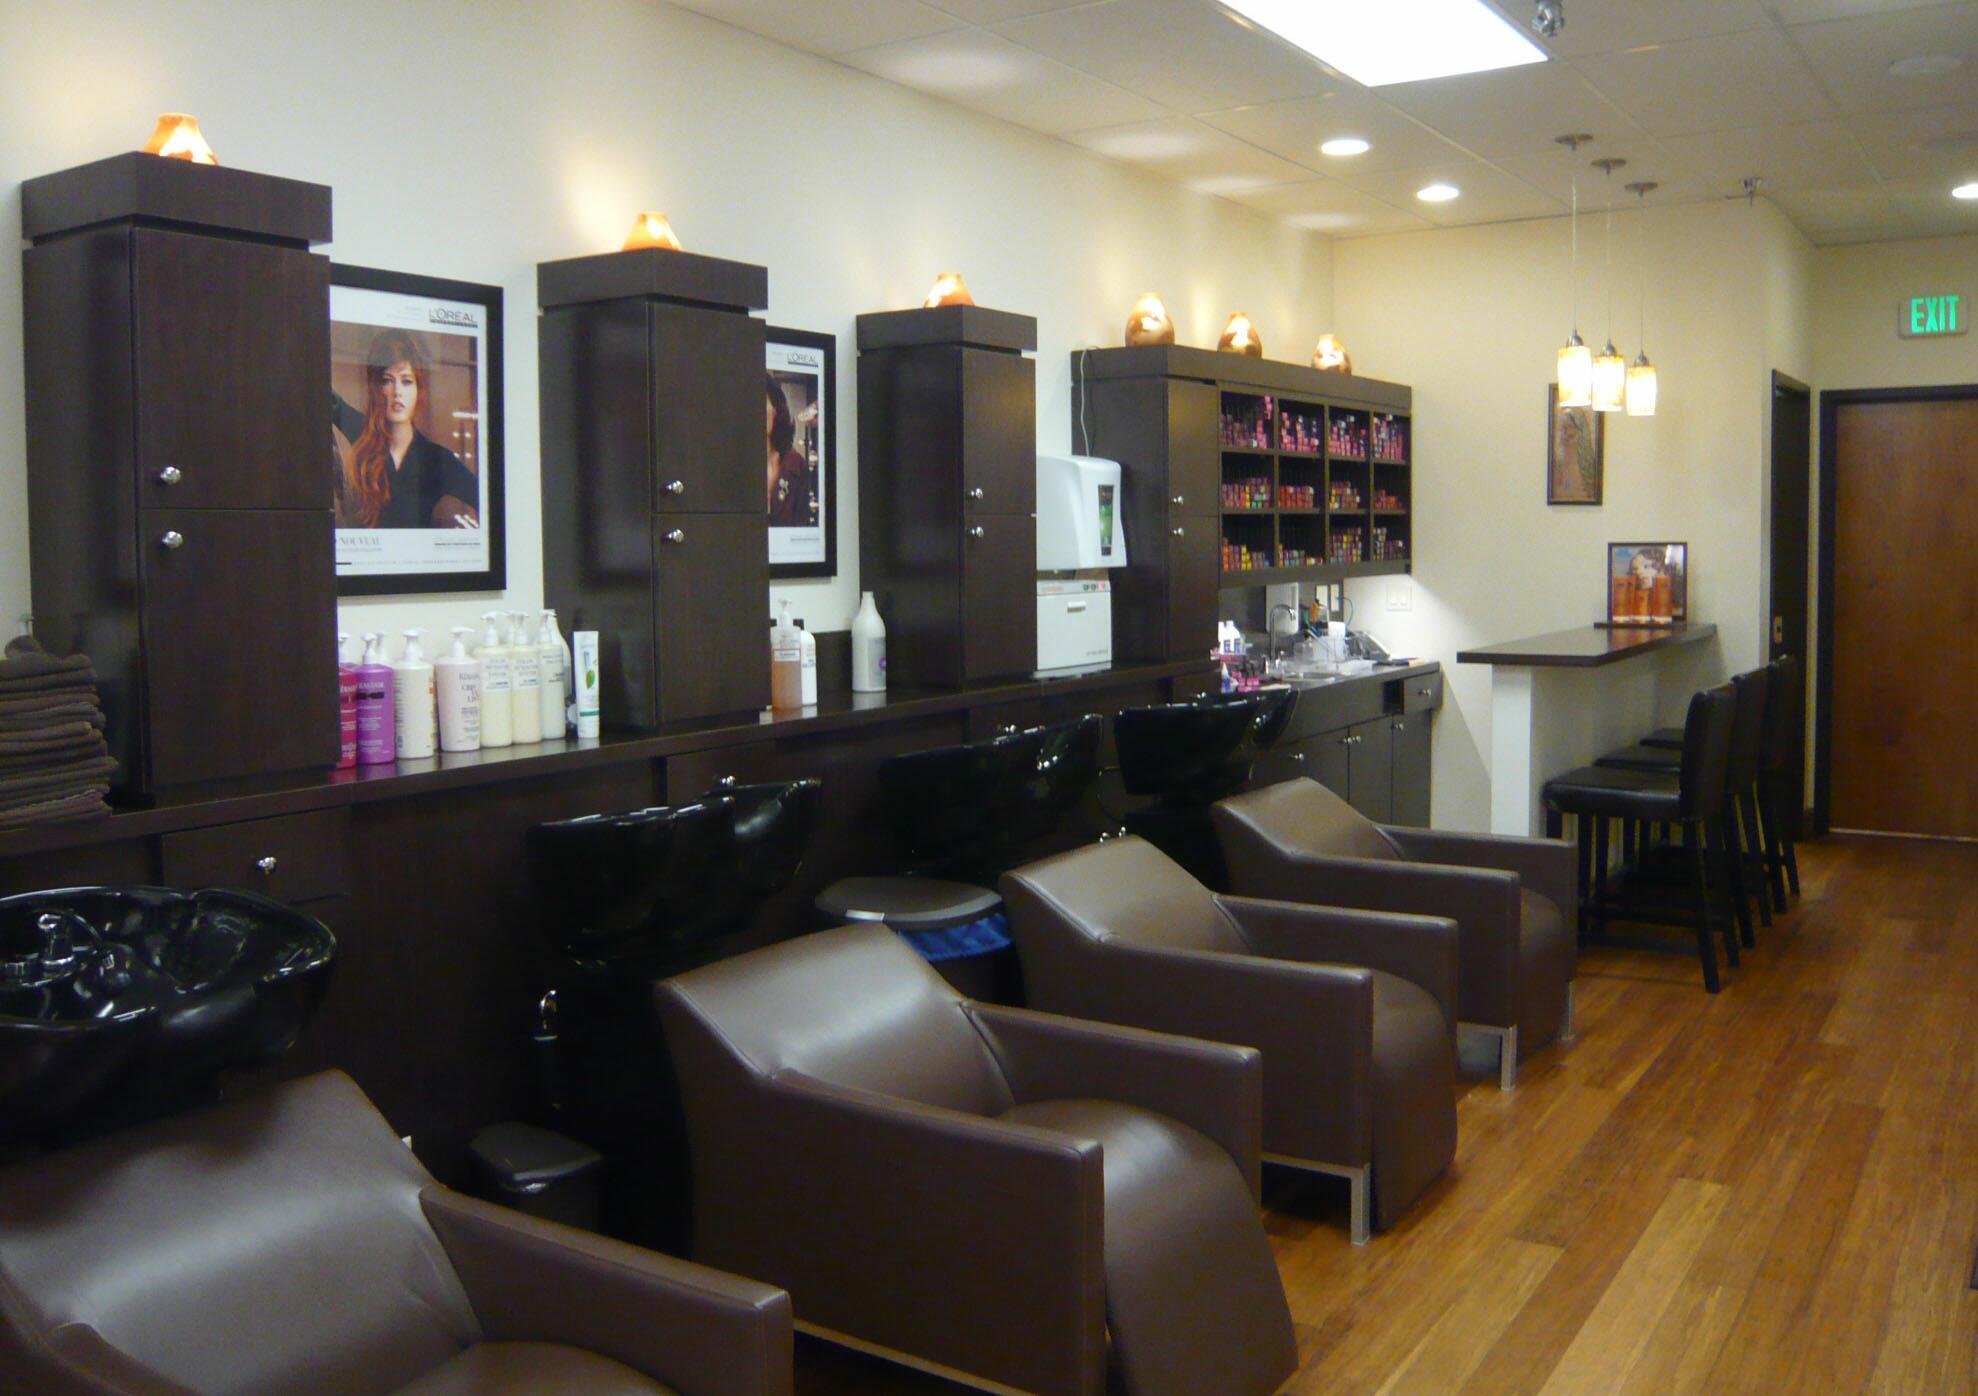 Design house hair - Salon Craft Wash House Where Hair Salon Clients Receive Luxurious Shampoo Scalp Massage And Hot Towel Service Salon Craft Wash House Where Hair Salon